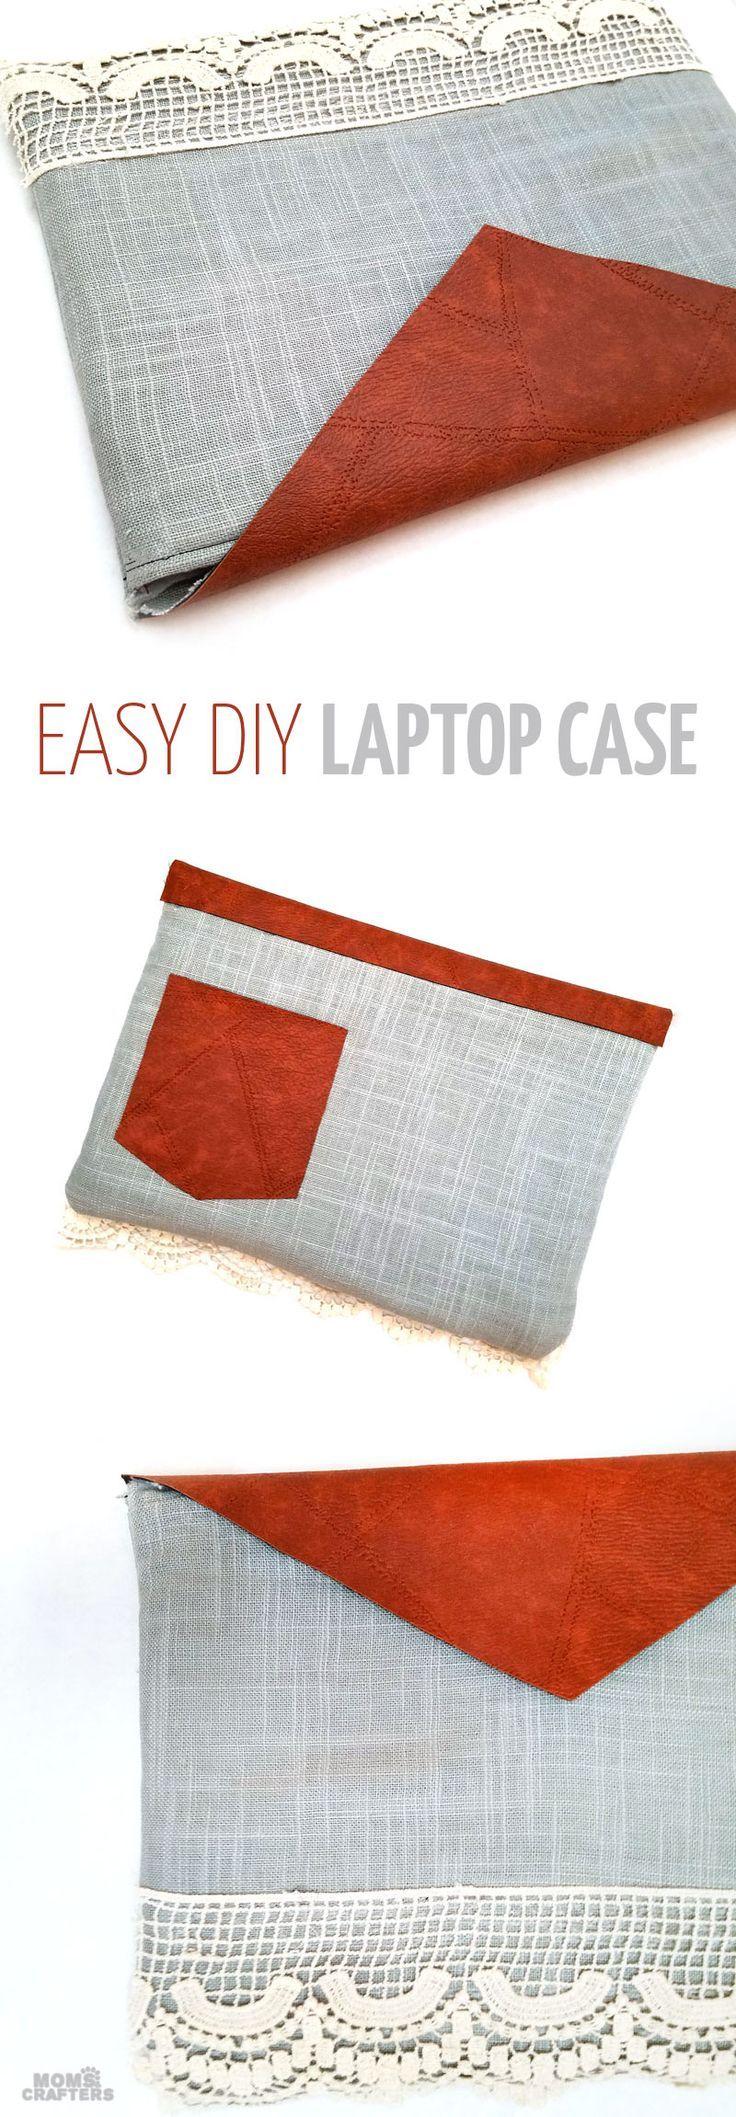 Make our own laptop case! Diy laptop, Sewing tutorials